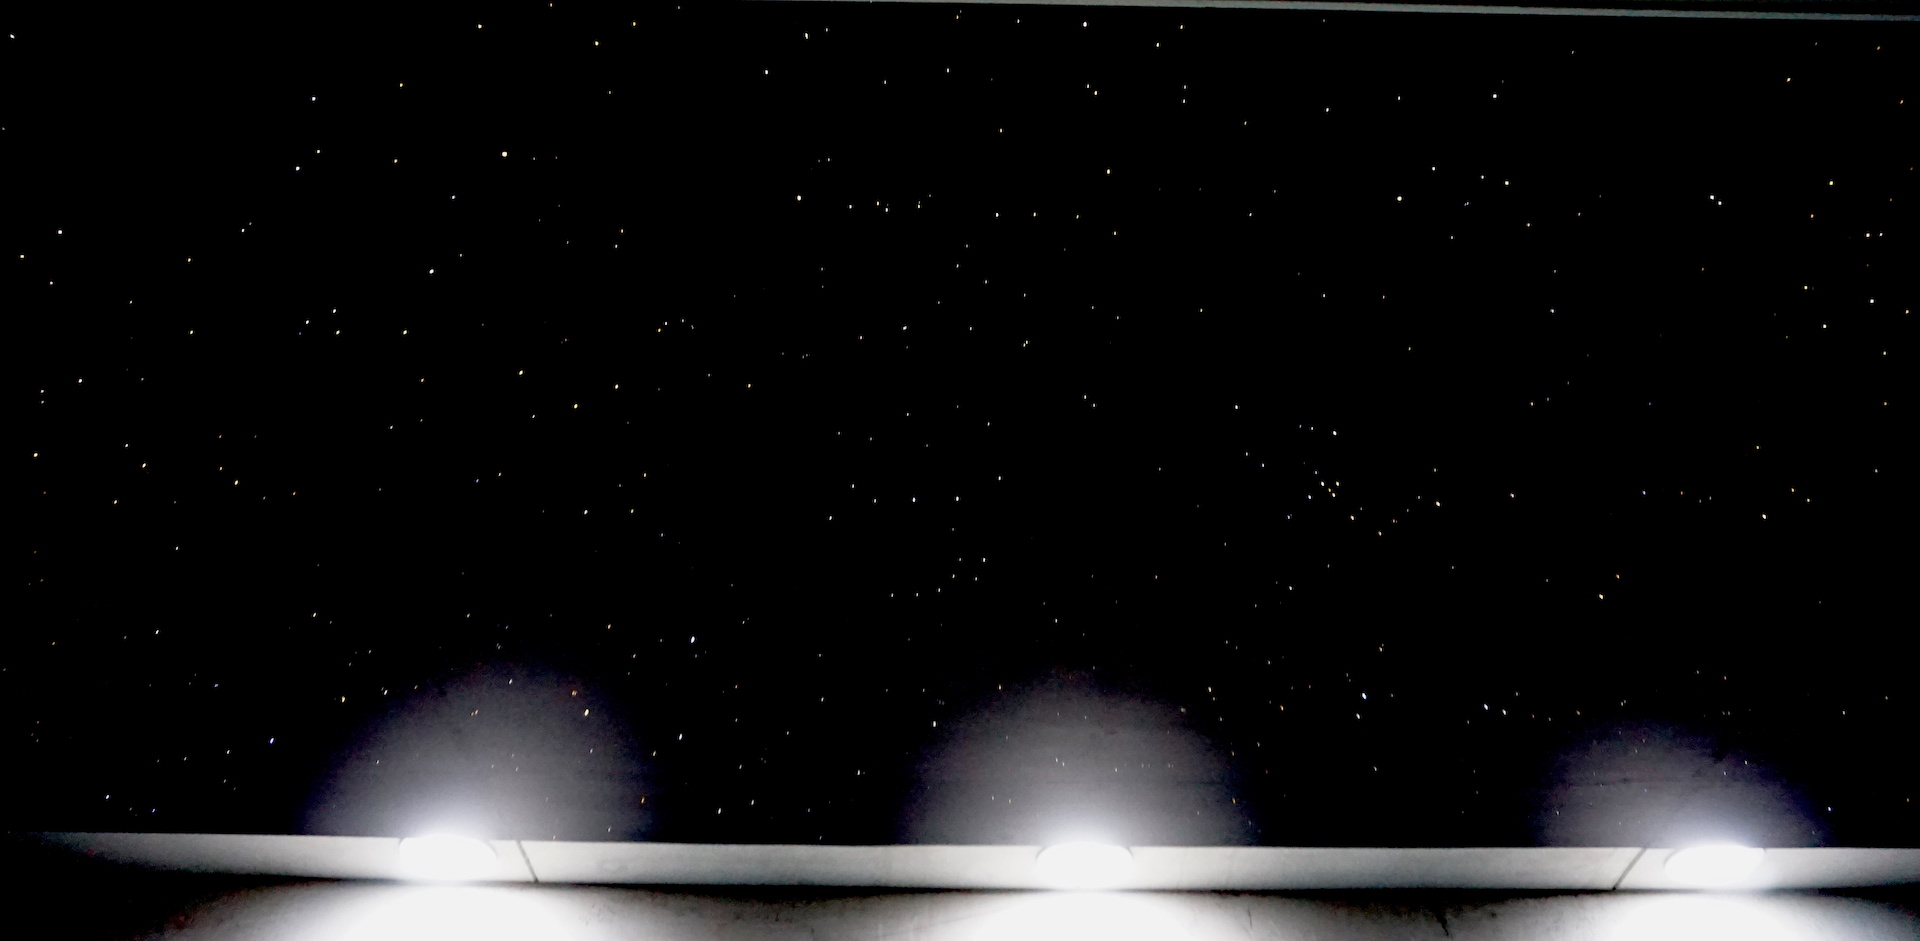 LED sterrenhemel verlichting plafond glasvezel MyCosmos zwembad techniek licht sterren wellness pool jacuzzi